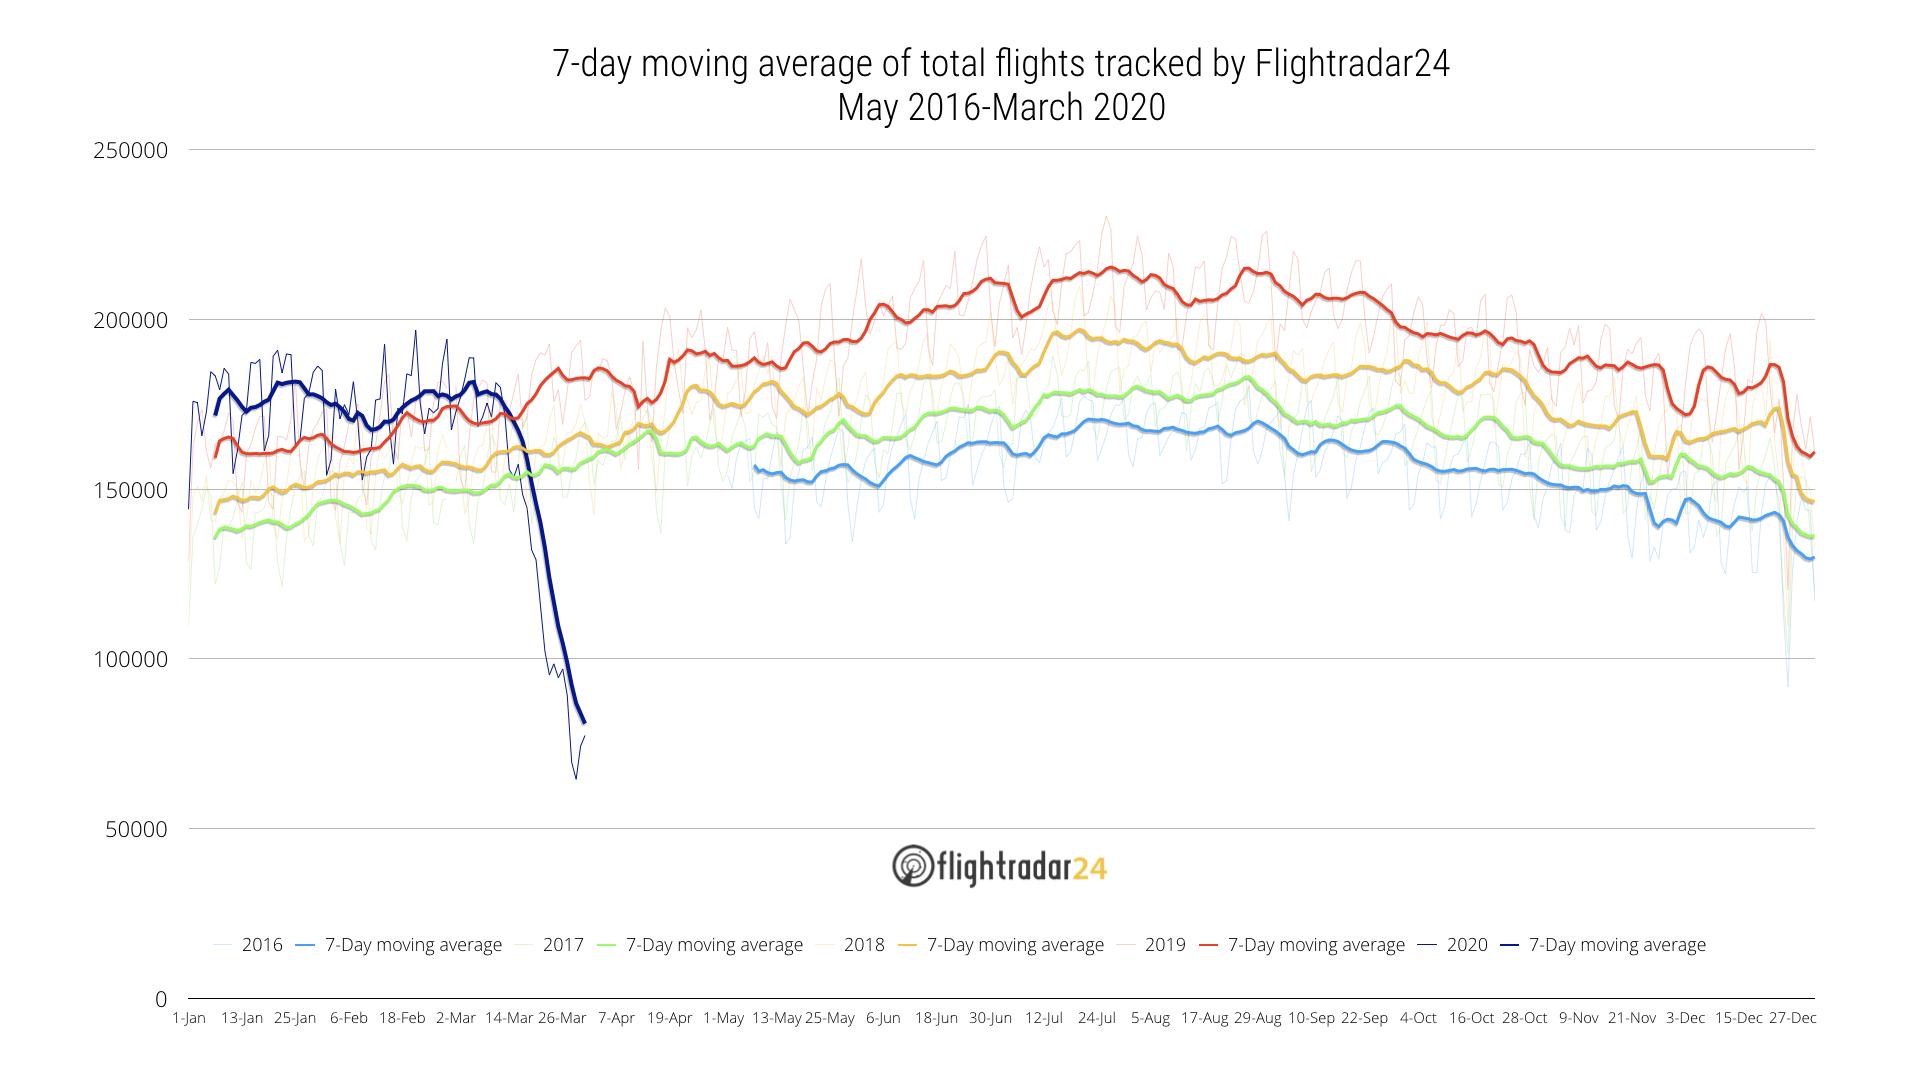 Total flights tracked by Flightradar24 through March 2020